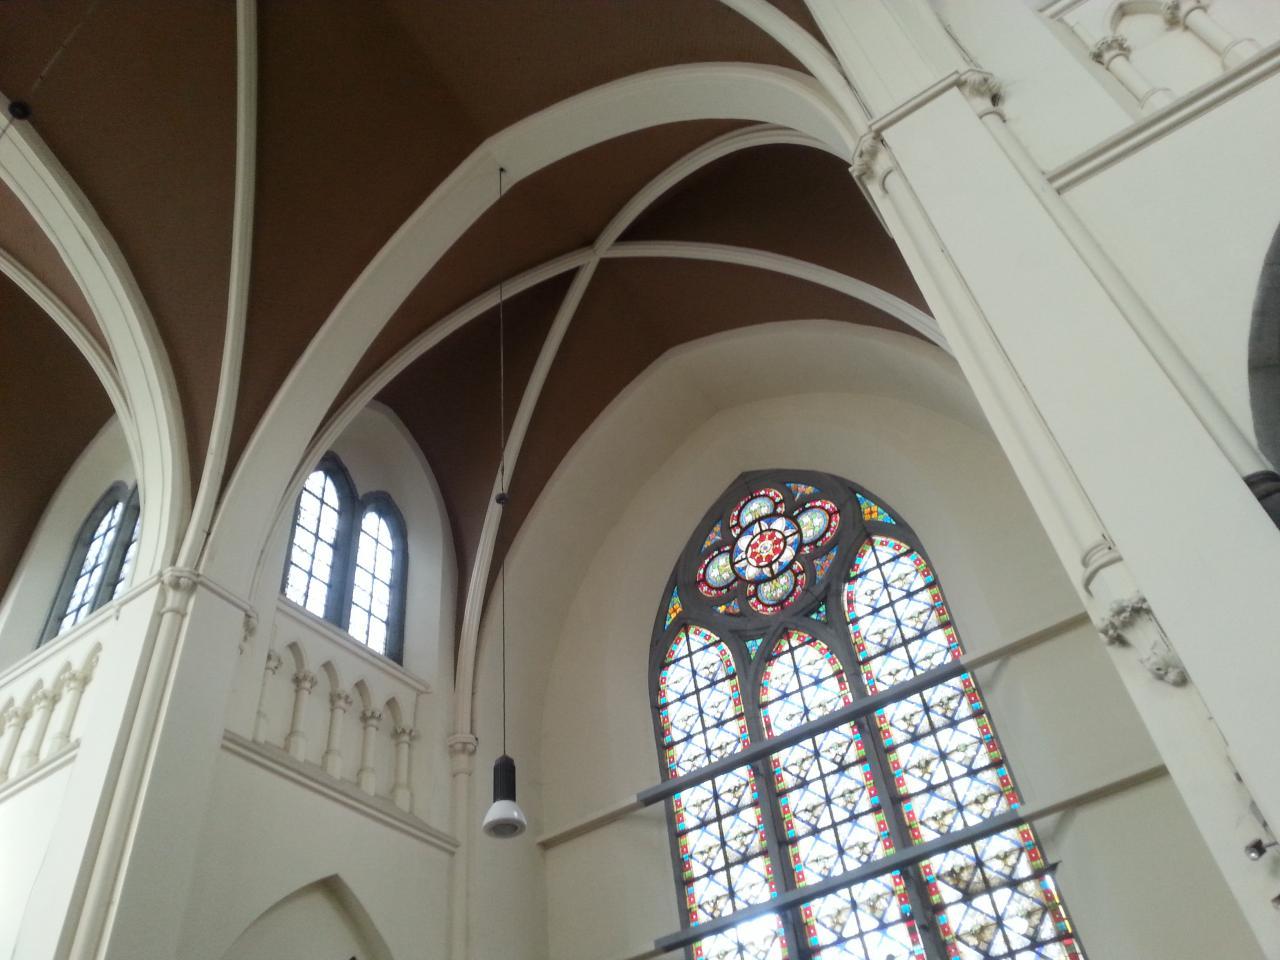 Eglise Ste-Walburge, plafond du transept